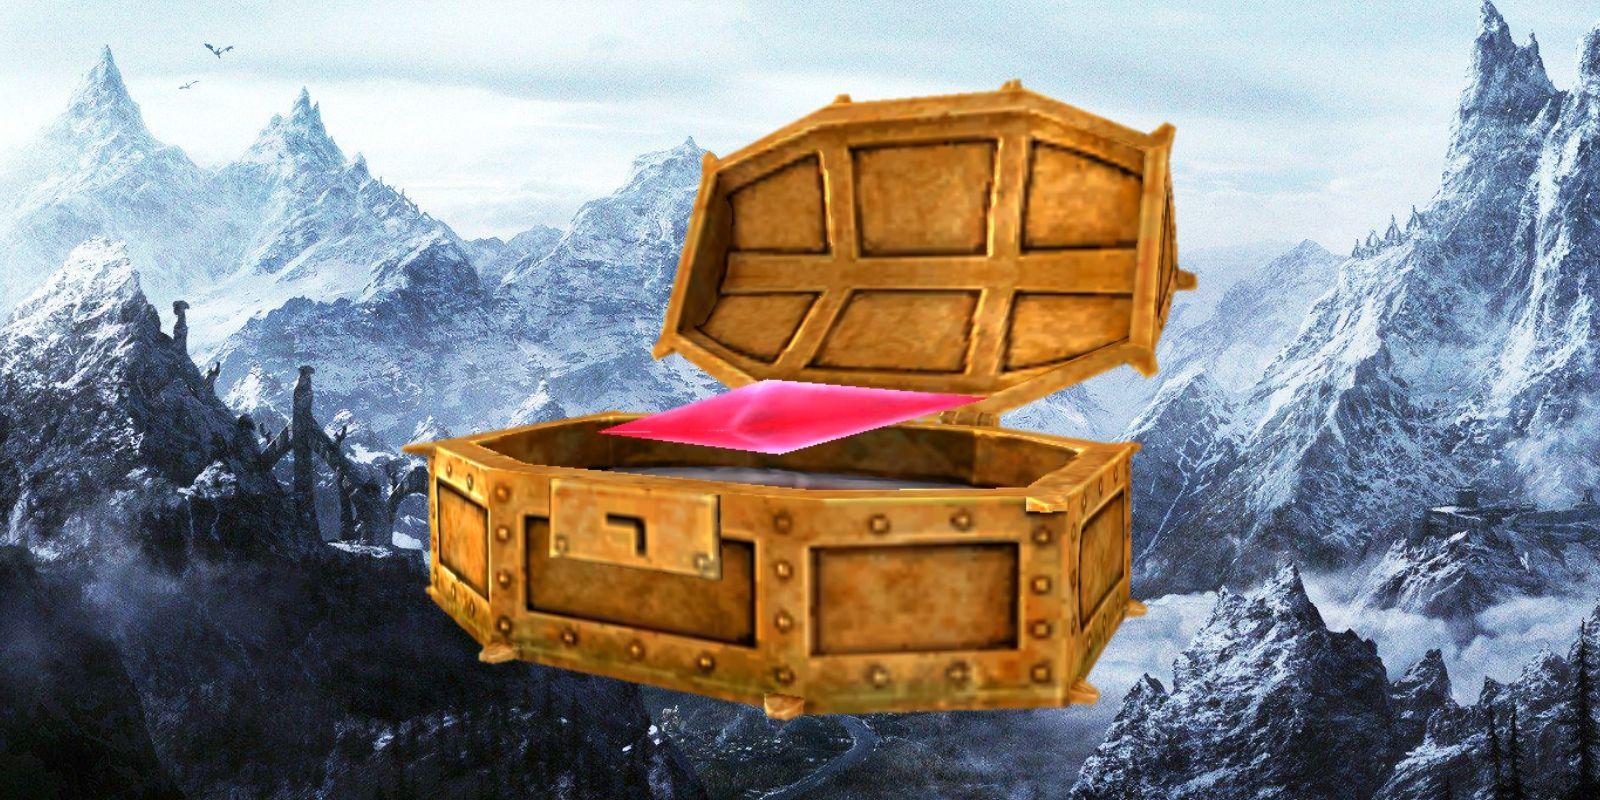 Skyrim's Stones Of Barenziah: Is The Reward Worth It